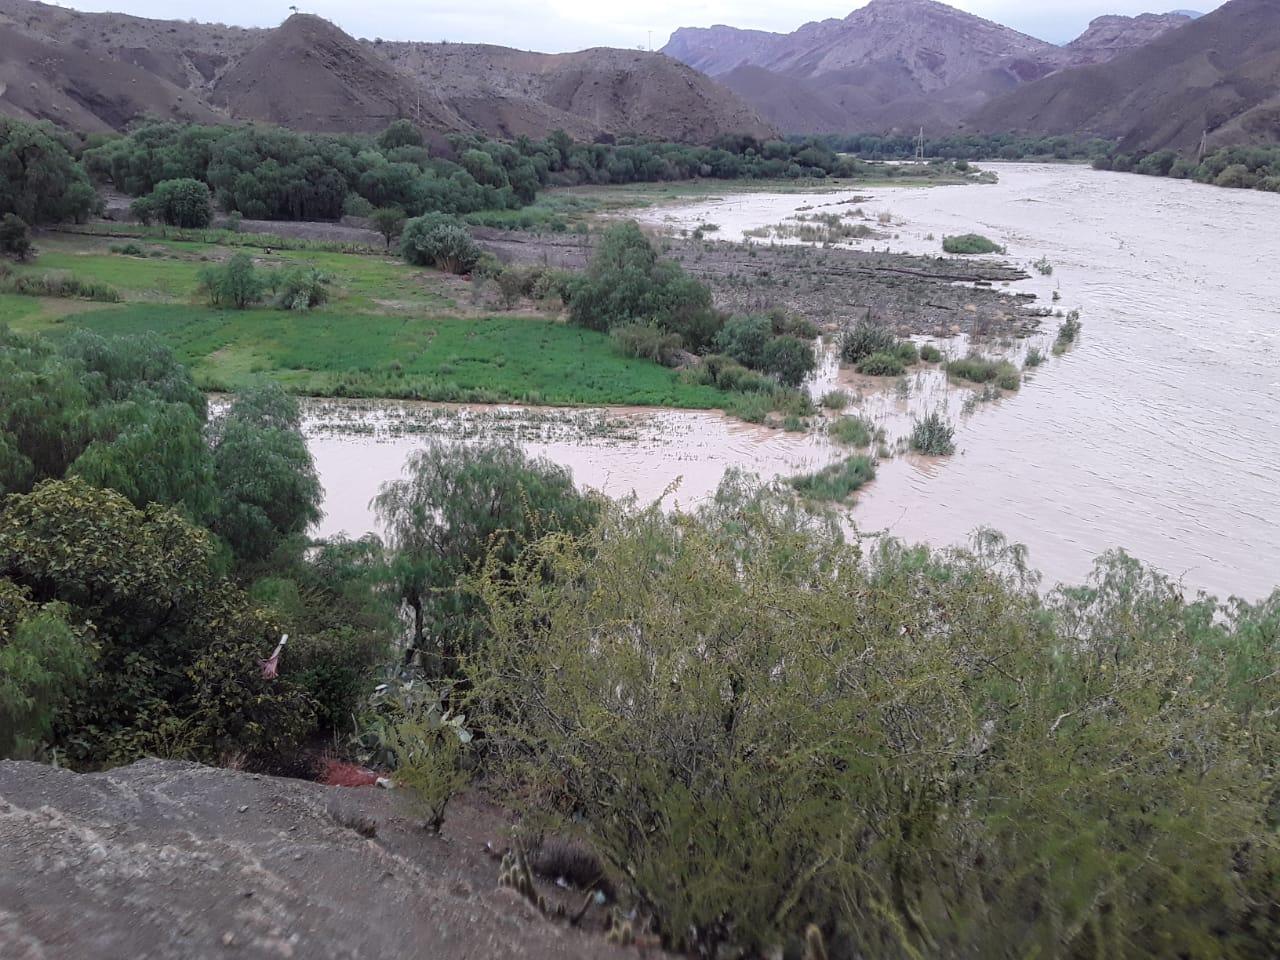 Reportan desborde del río San Juan del Oro (VIDEO)